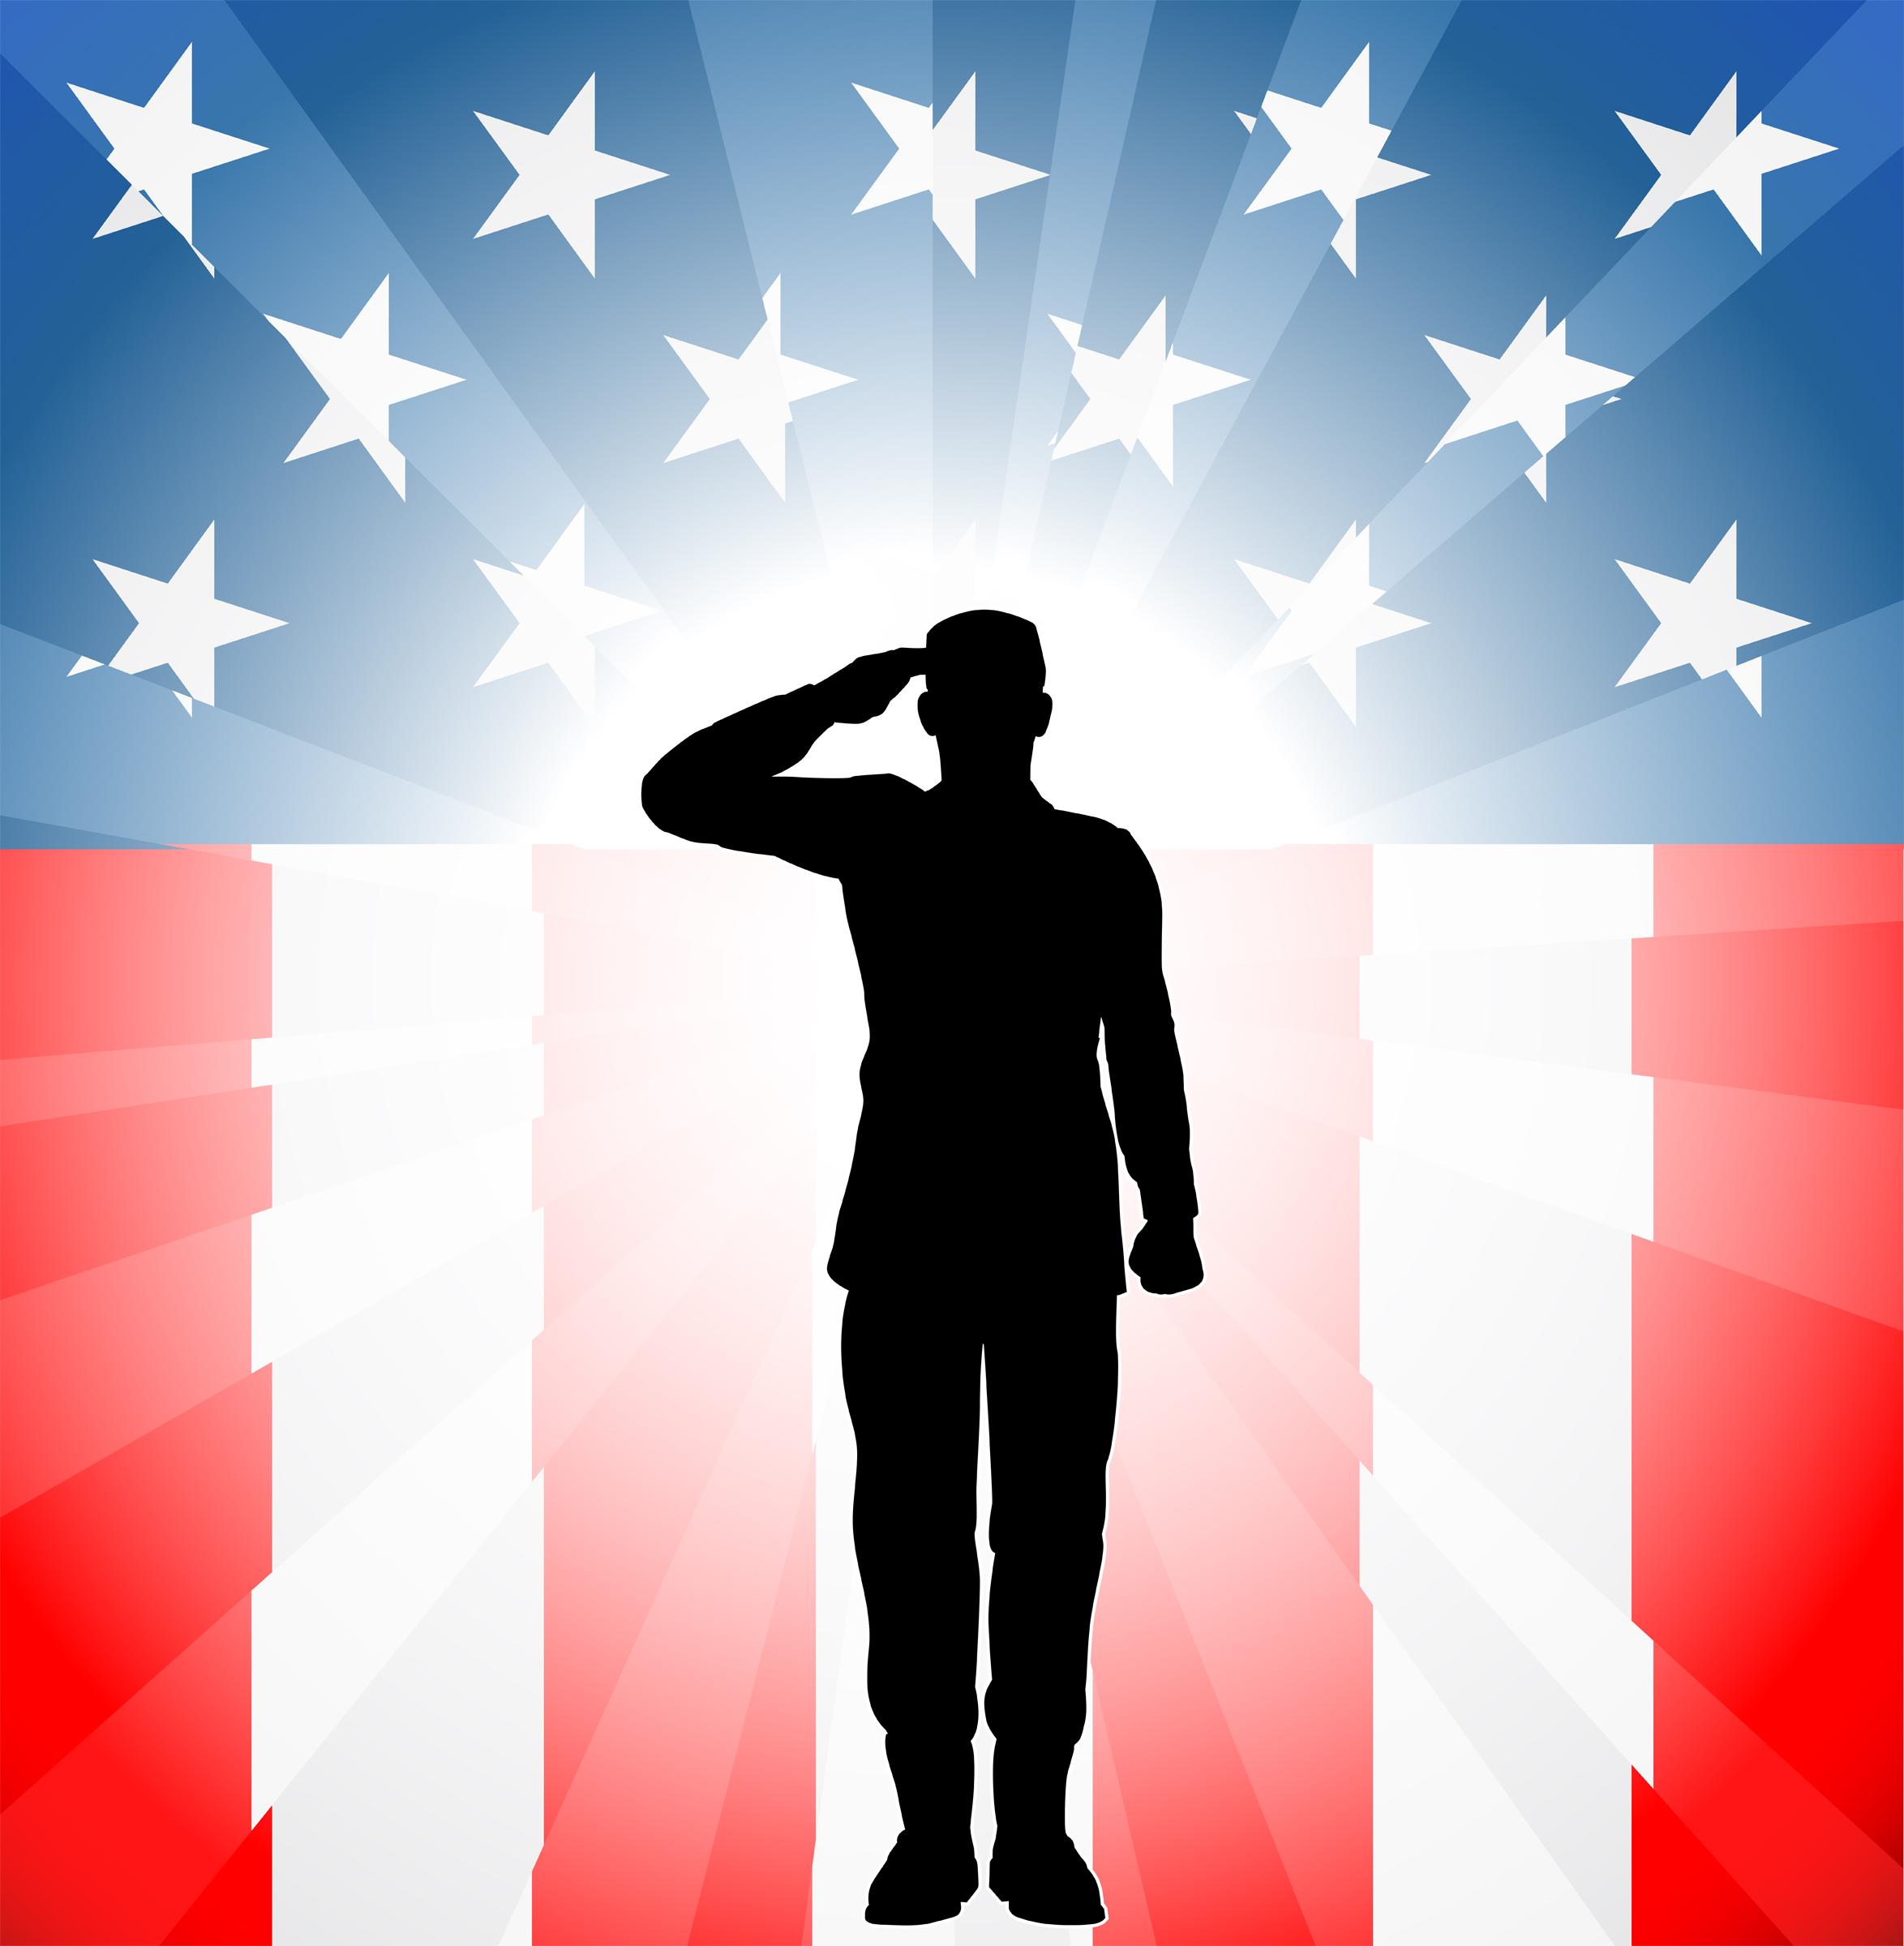 Army clipart veteran #2